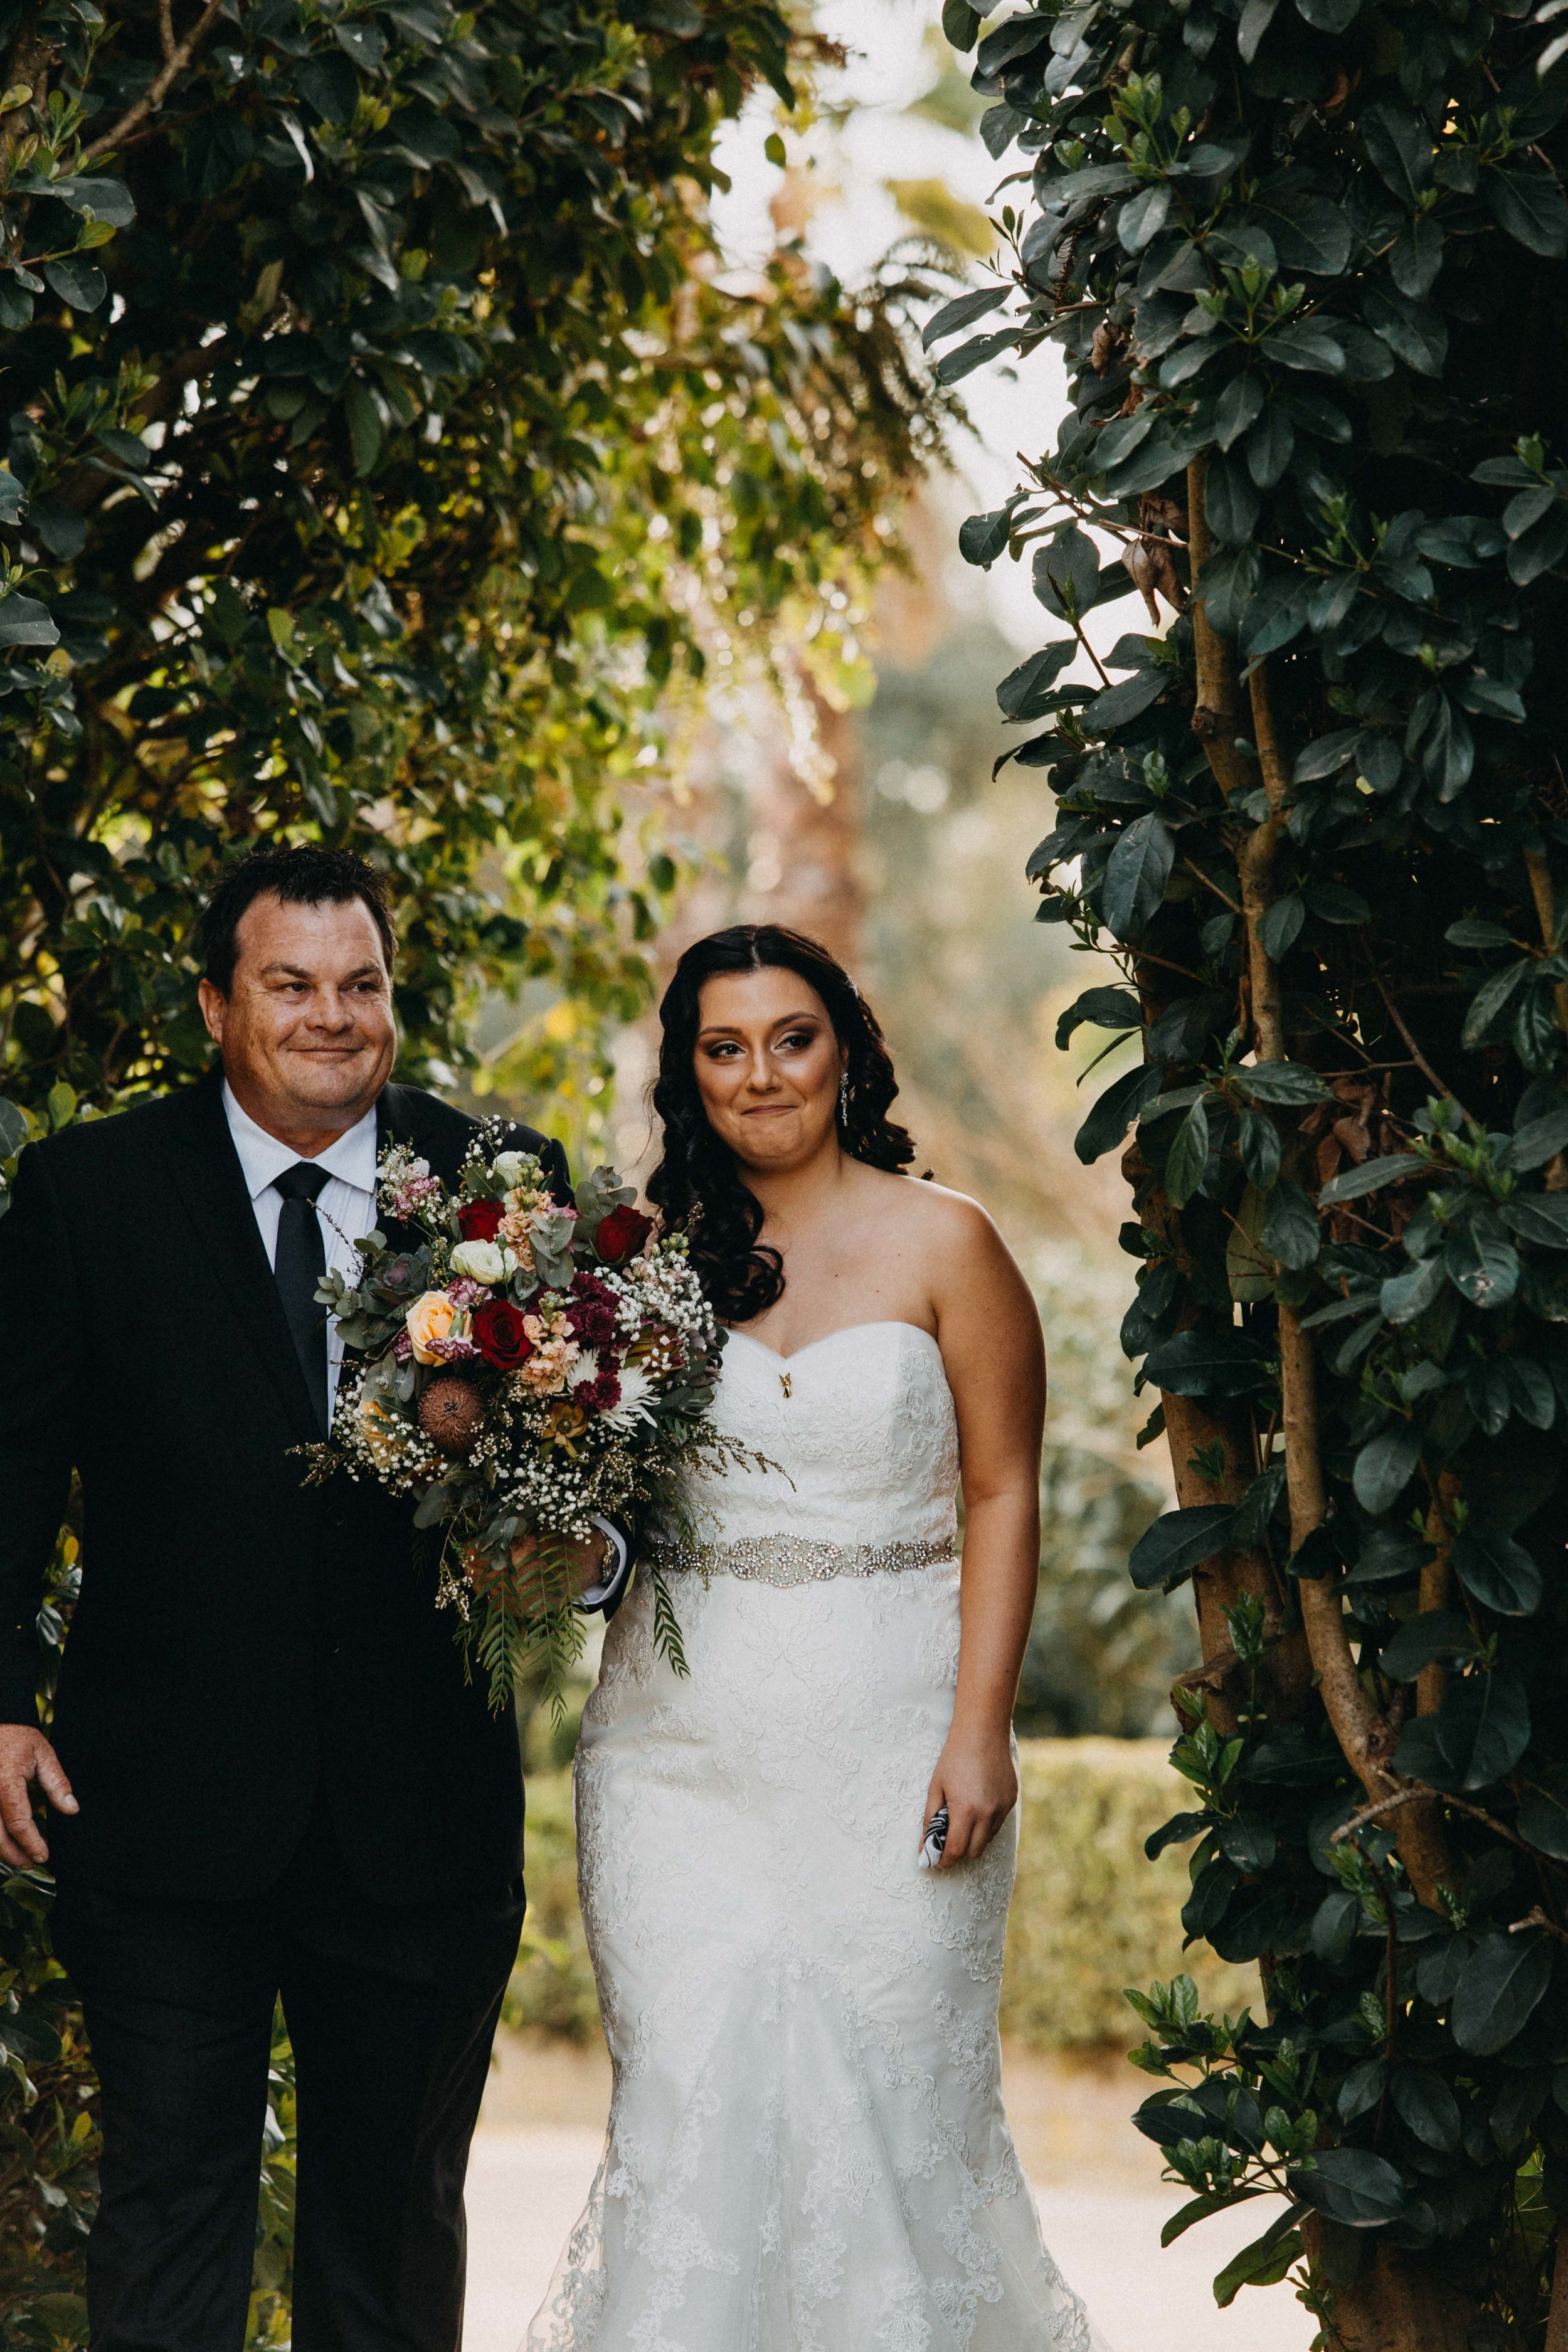 burnham-grove-camden-wedding-emilyobrienphotography-macarthur-56.jpg